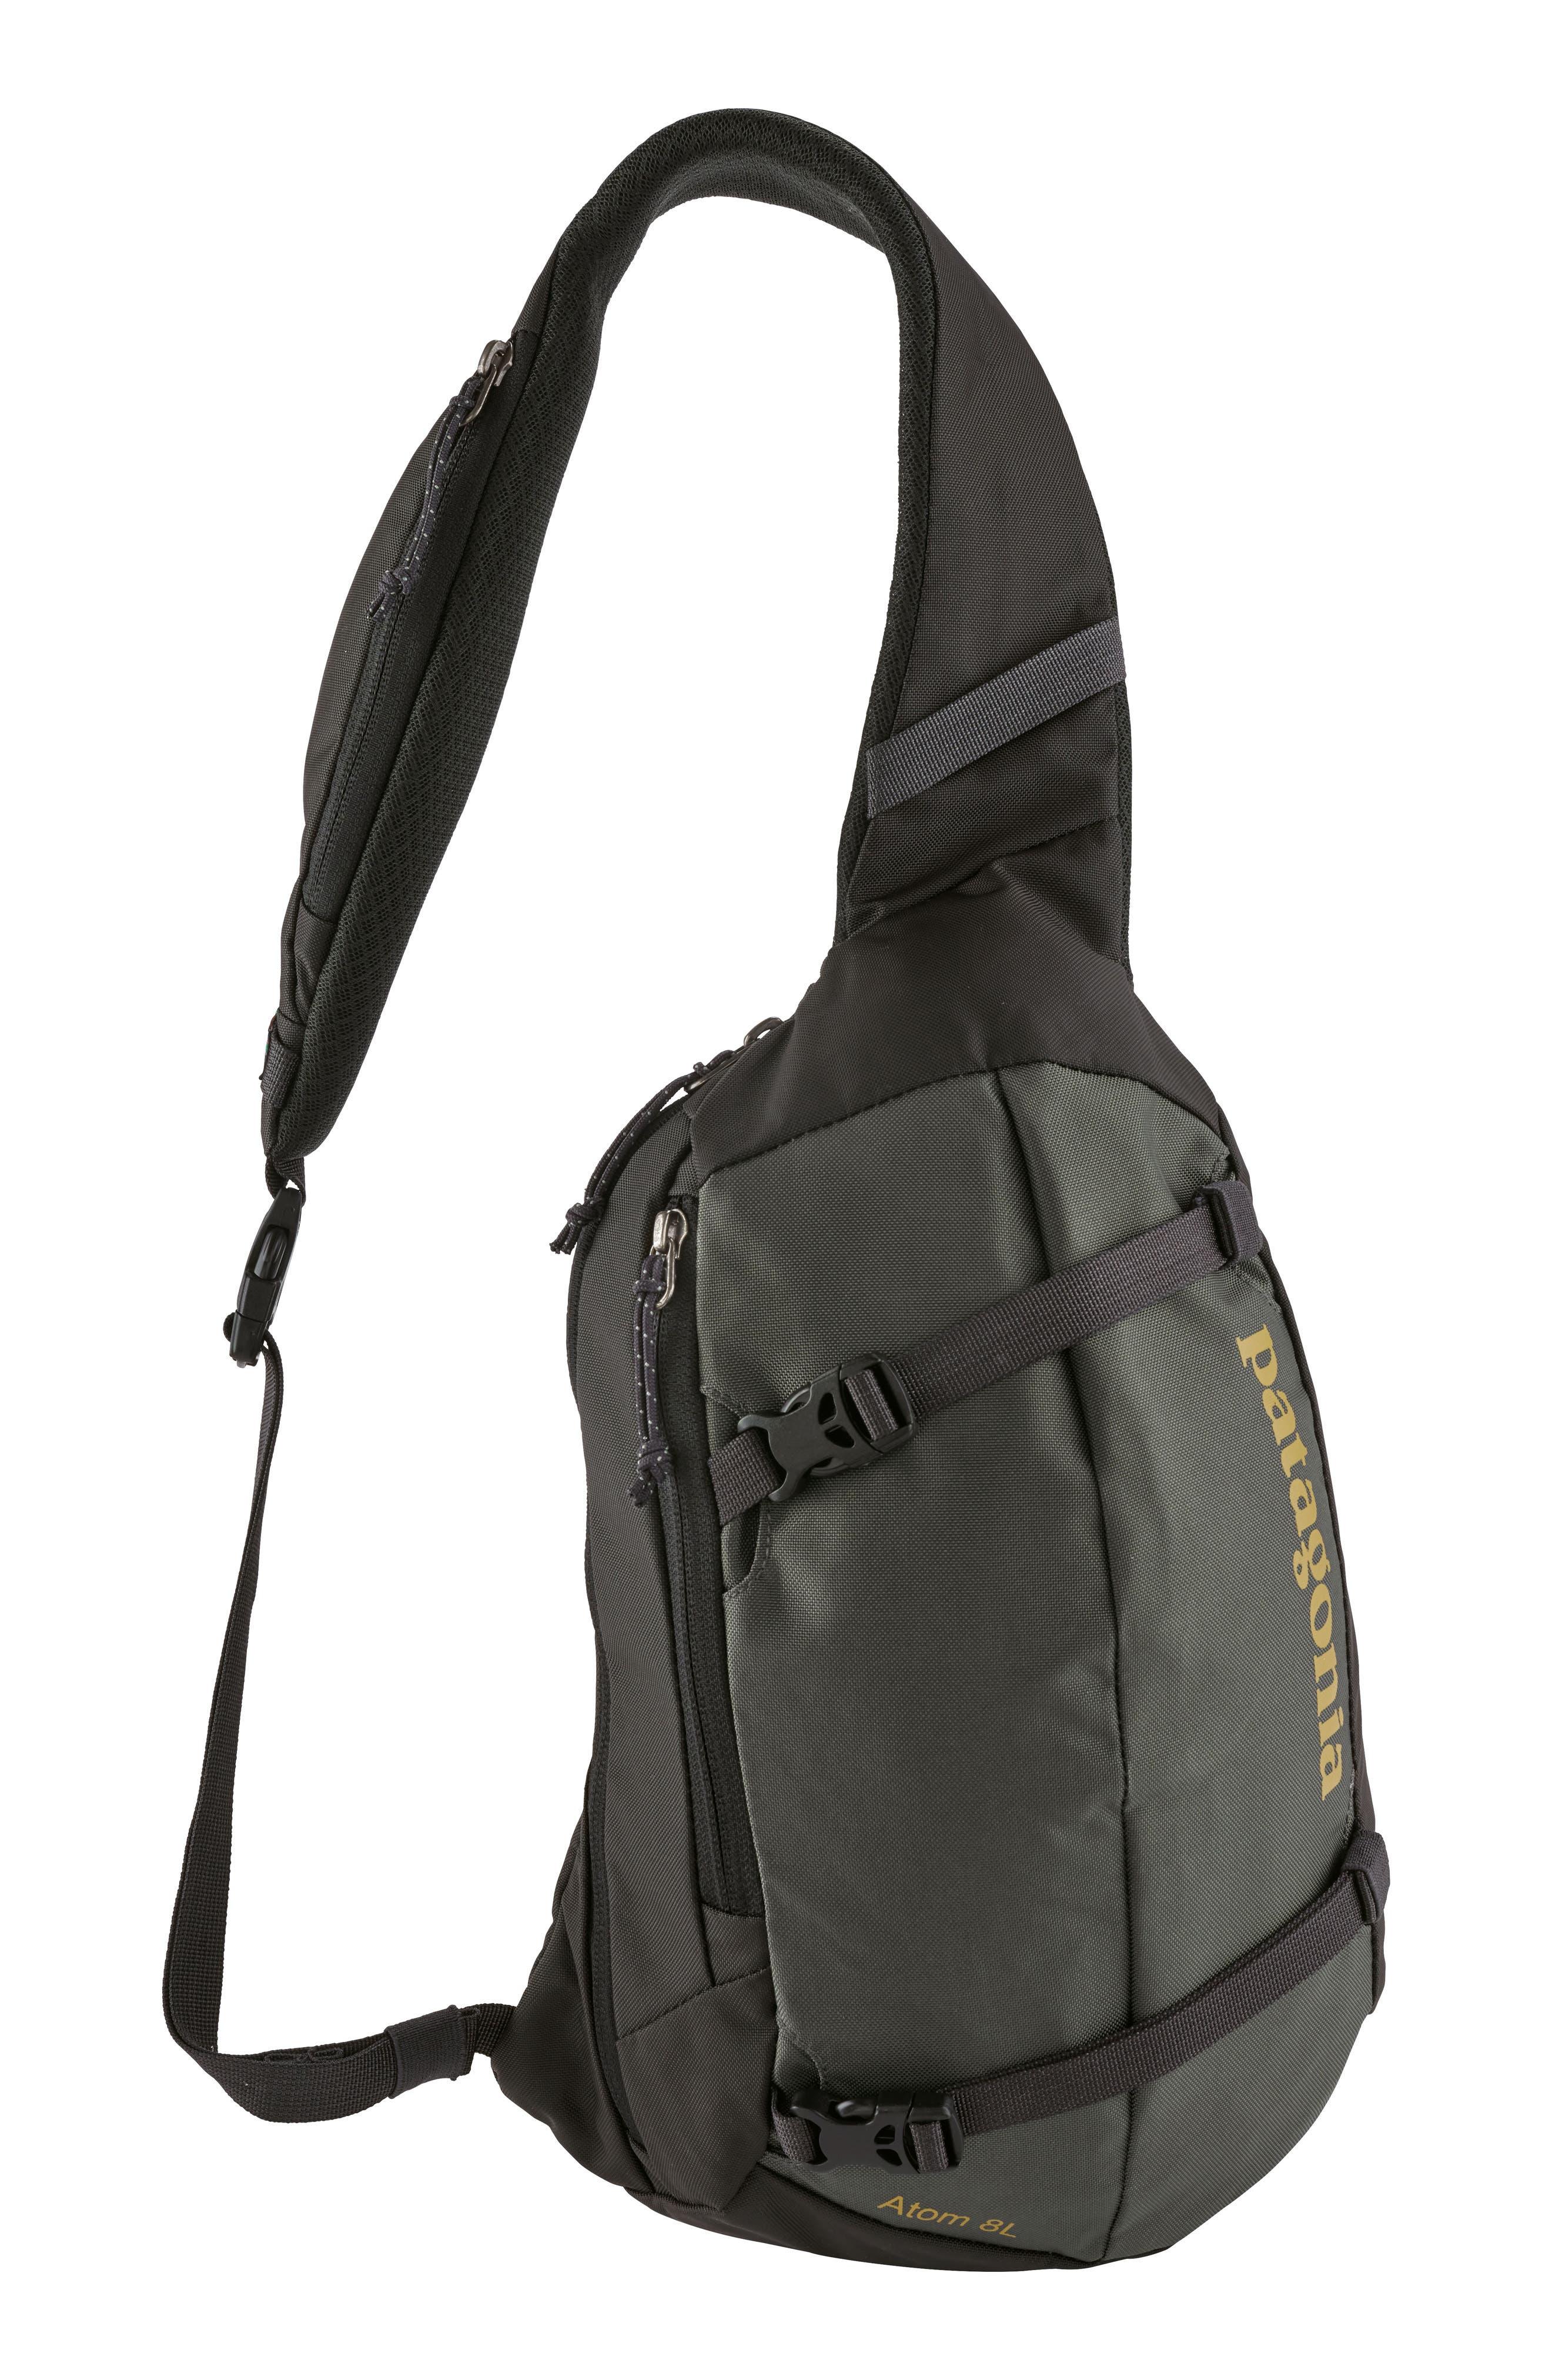 Patagonia Atom 8L Sling Backpack - Grey